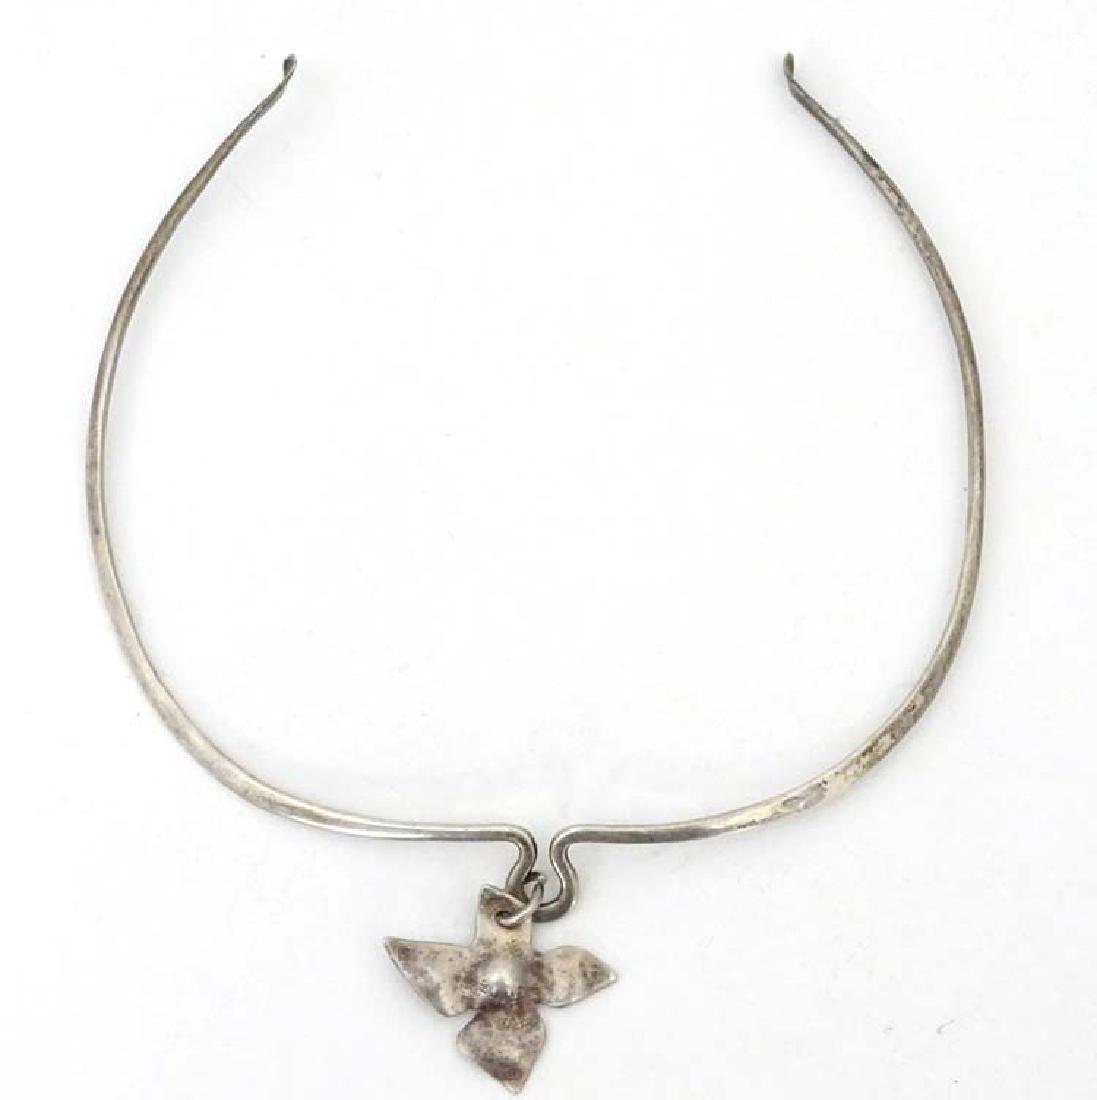 A white metal necklace of choker form with quatraform